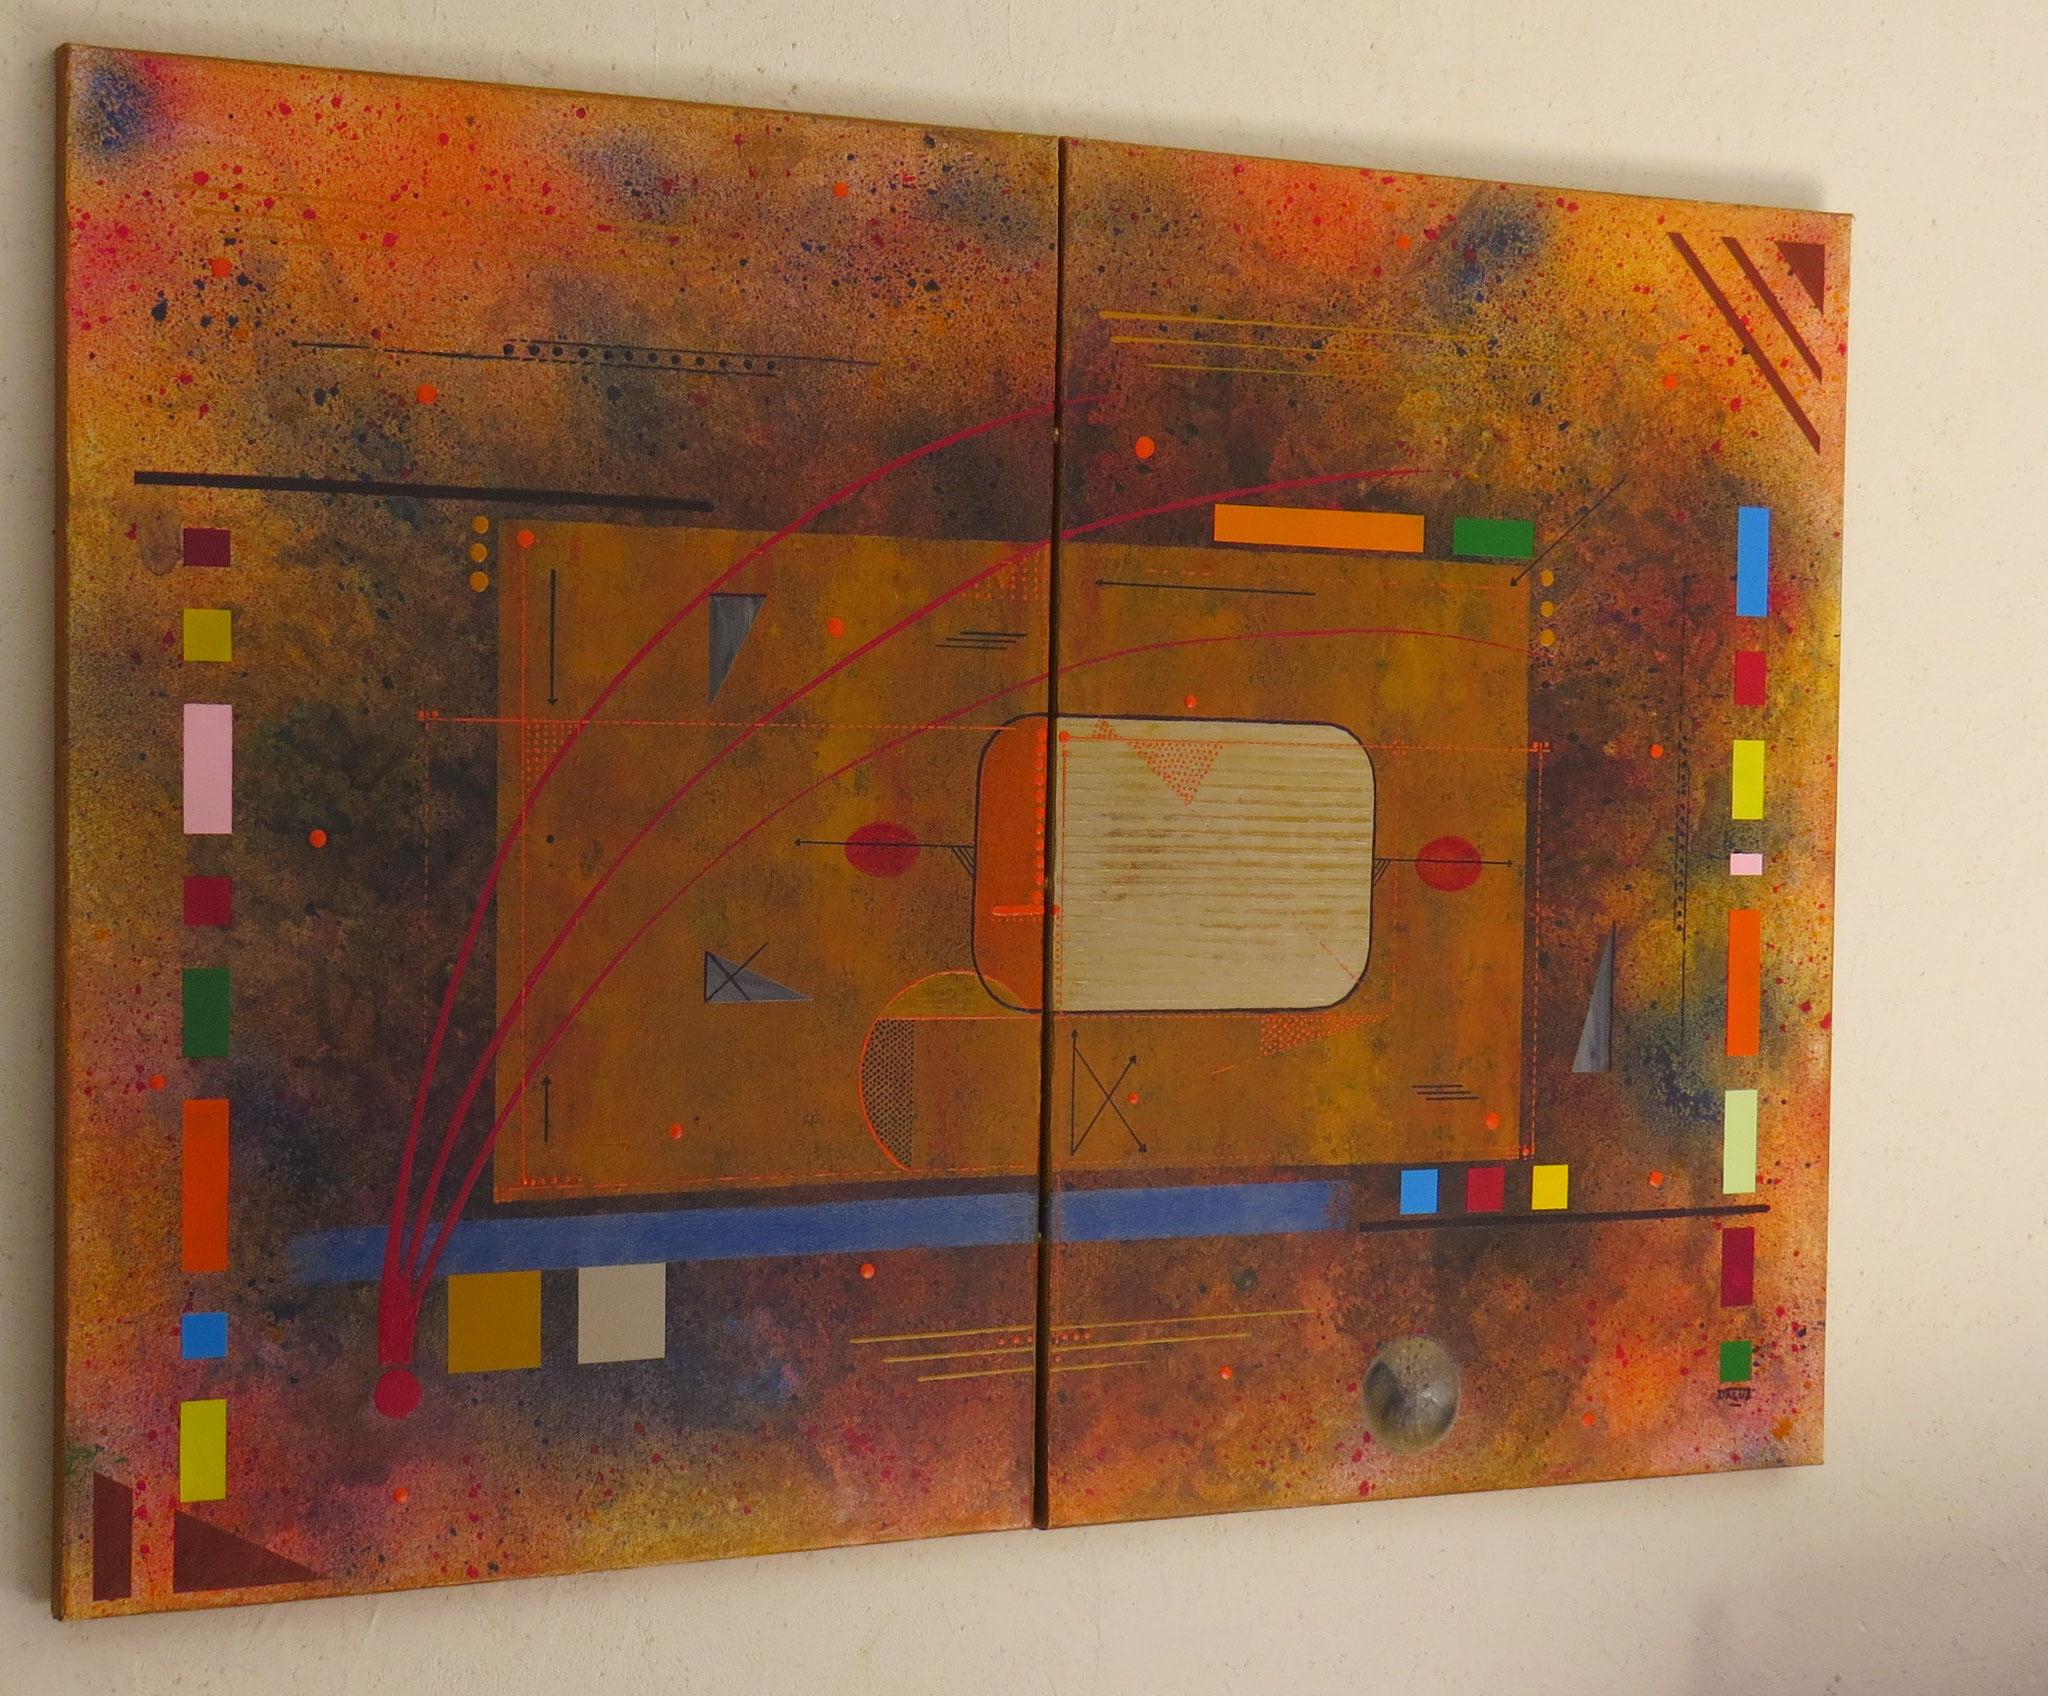 kappa - vue côté1 - DALUZ GALEGO - peinture abstraite